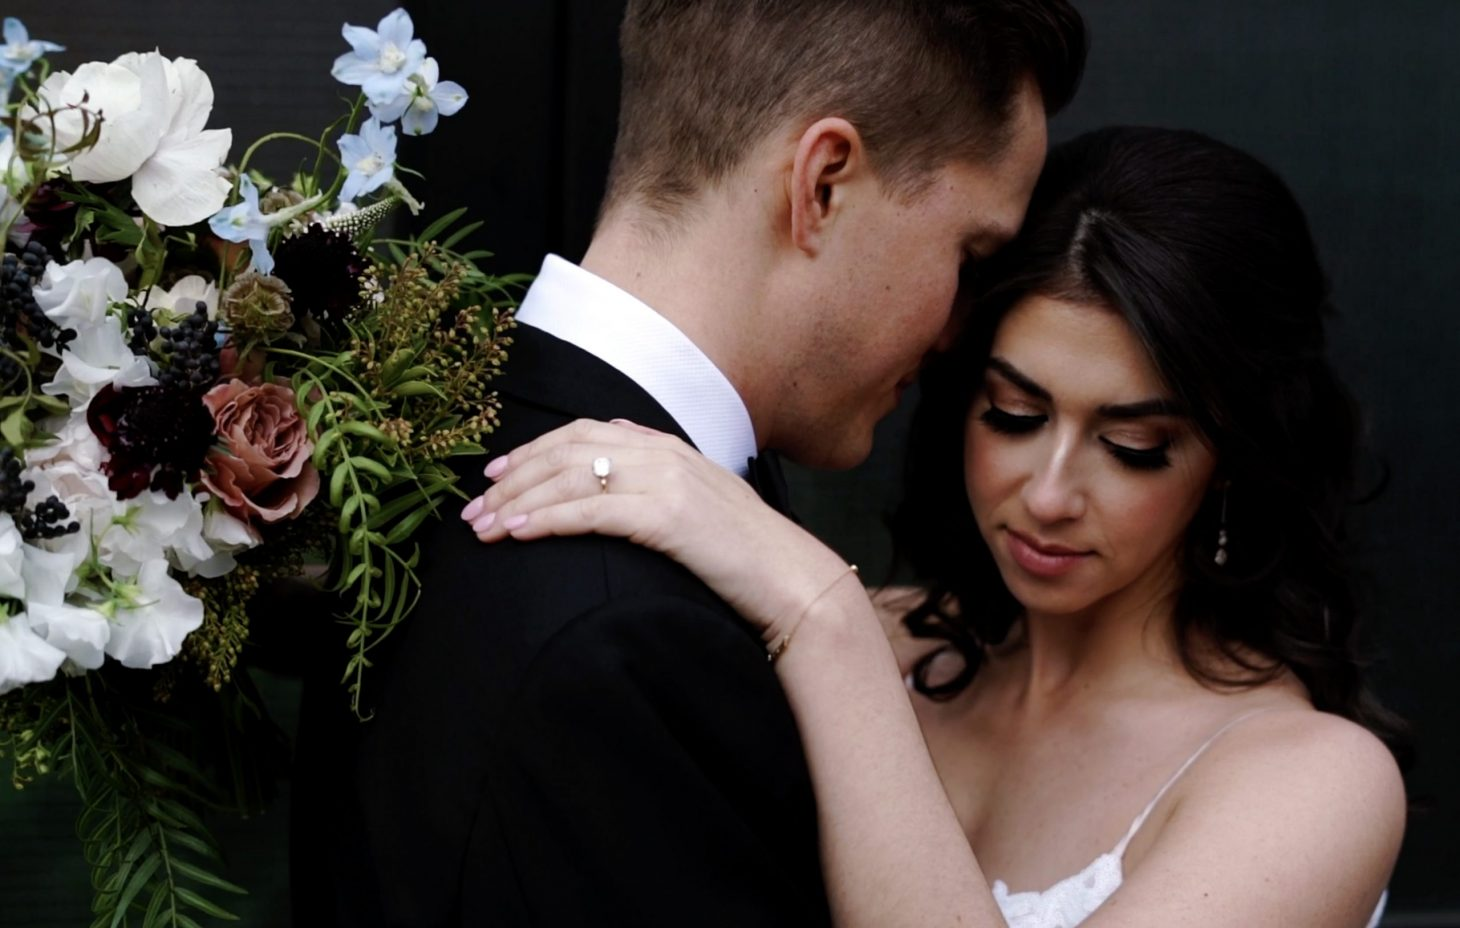 501 Union Wedding Video, 501 Union Wedding, 501 Union Wedding Brooklyn, Brooklyn Wedding Videographer, Brooklyn Wedding Photographer, NYC Wedding Videographer, NYC Wedding Video, Green Building Wedding Video